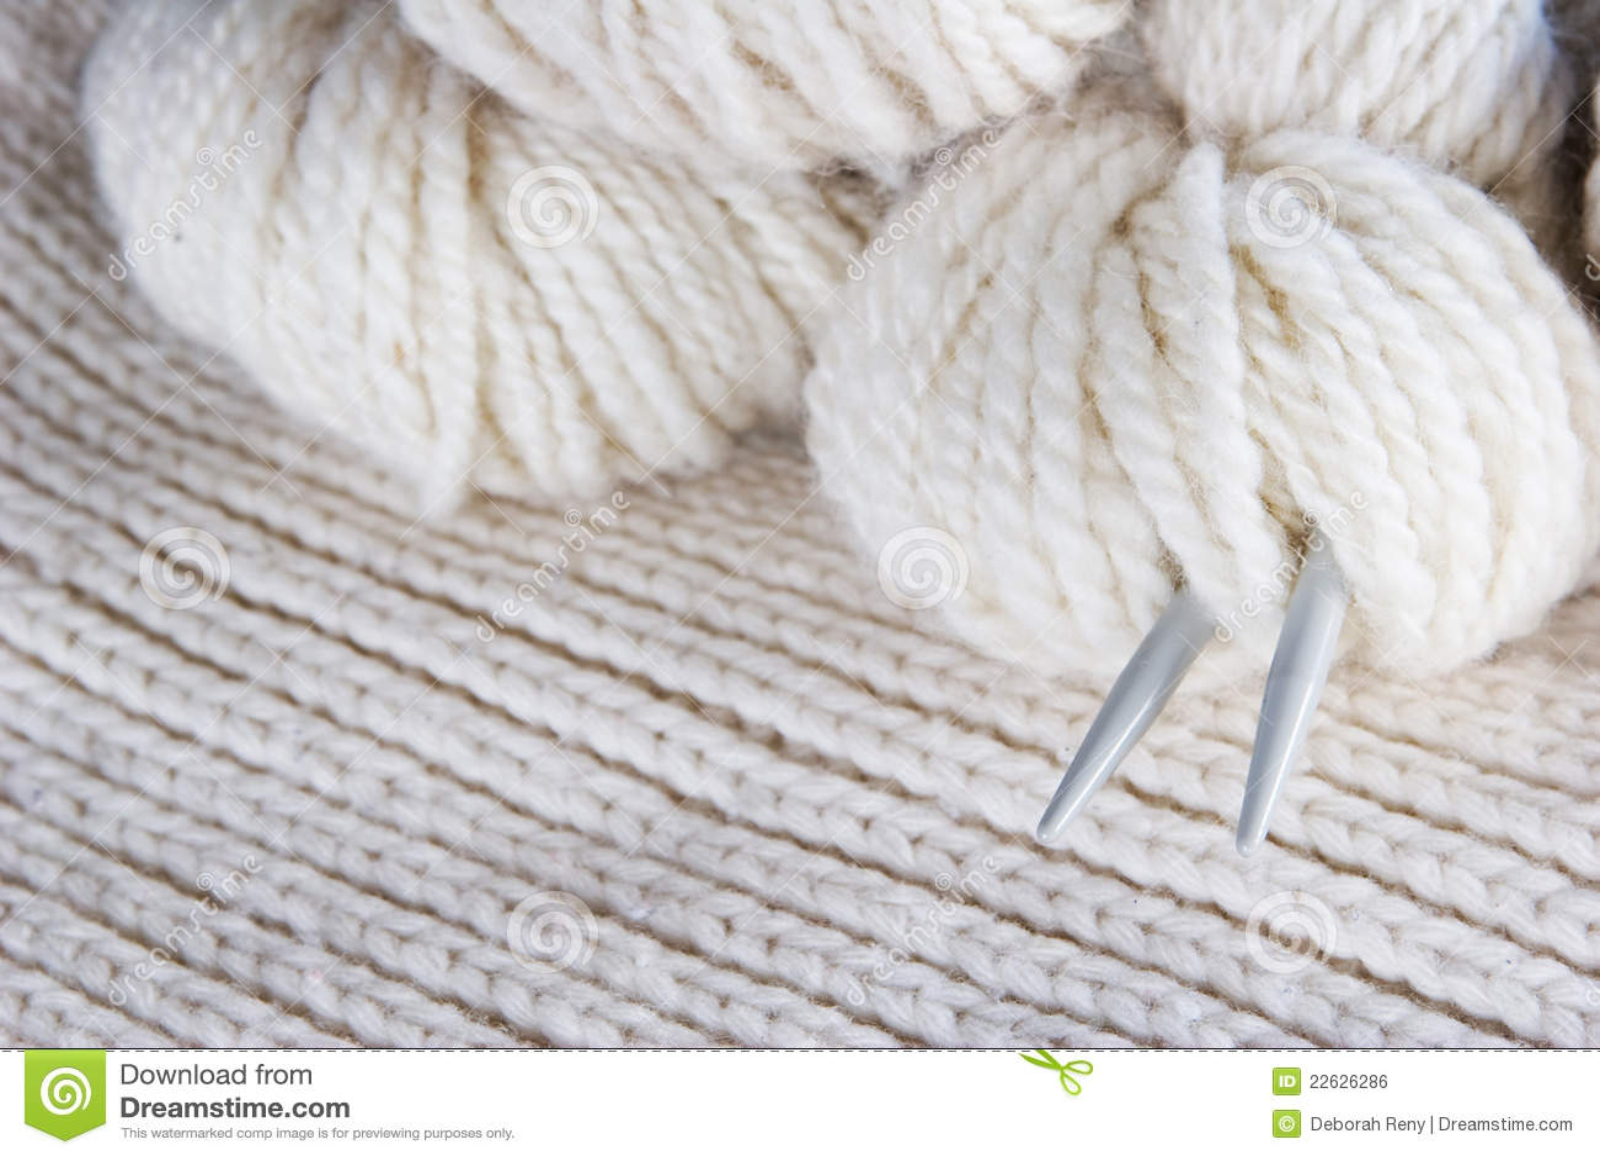 Craft Background Knitting Royalty Free Stock Image